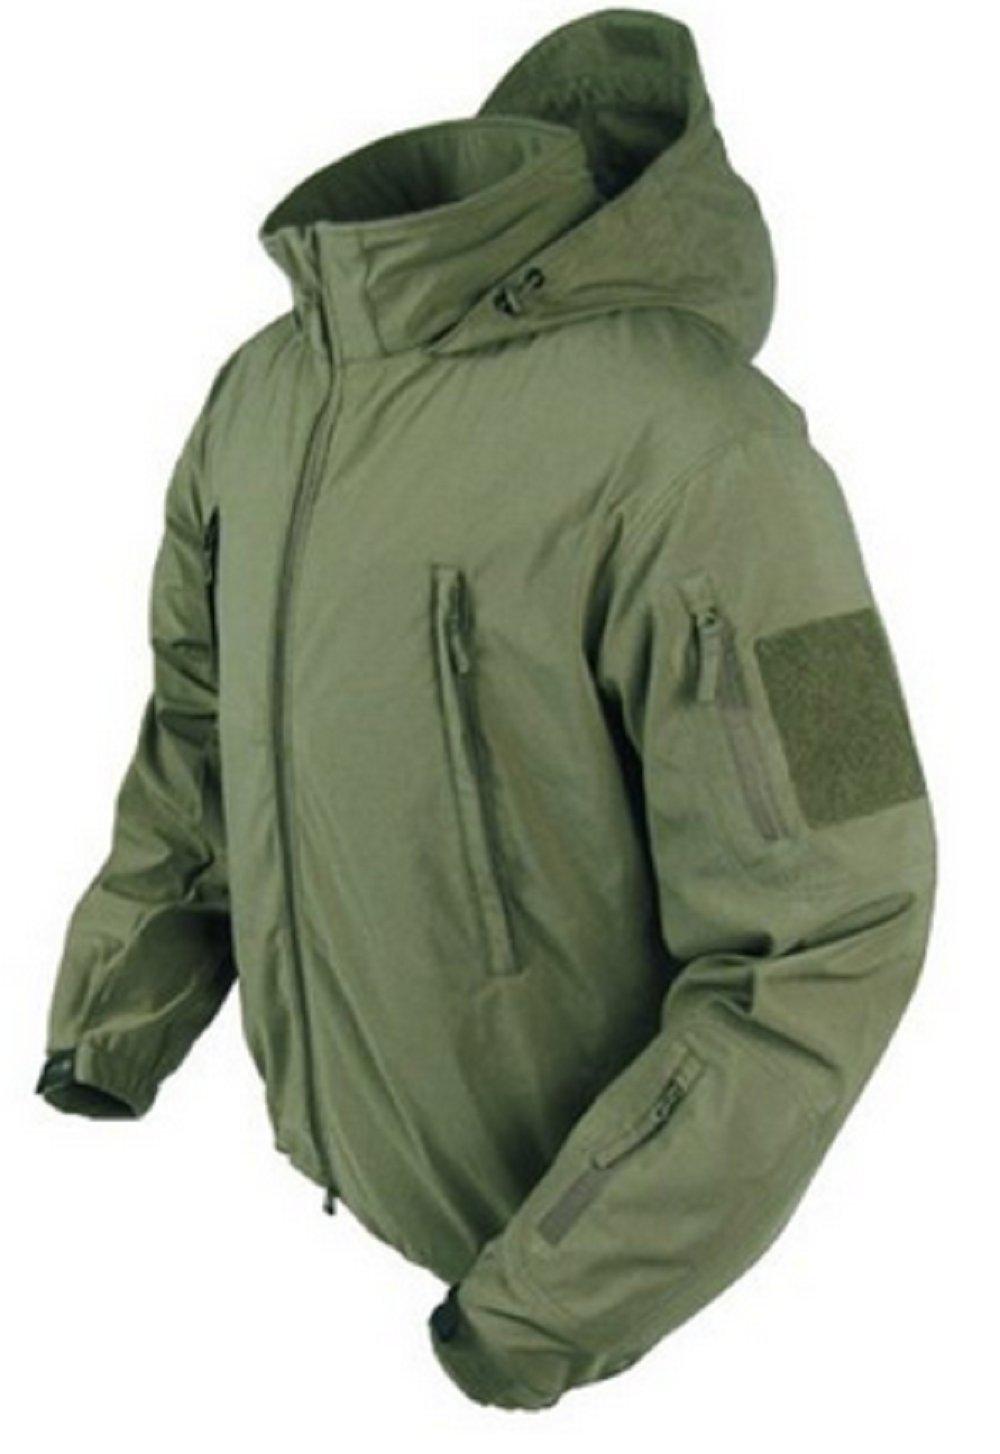 Condor Summit Zero Lightweight Soft Shell Jacket, OD - M Condor Outdoor